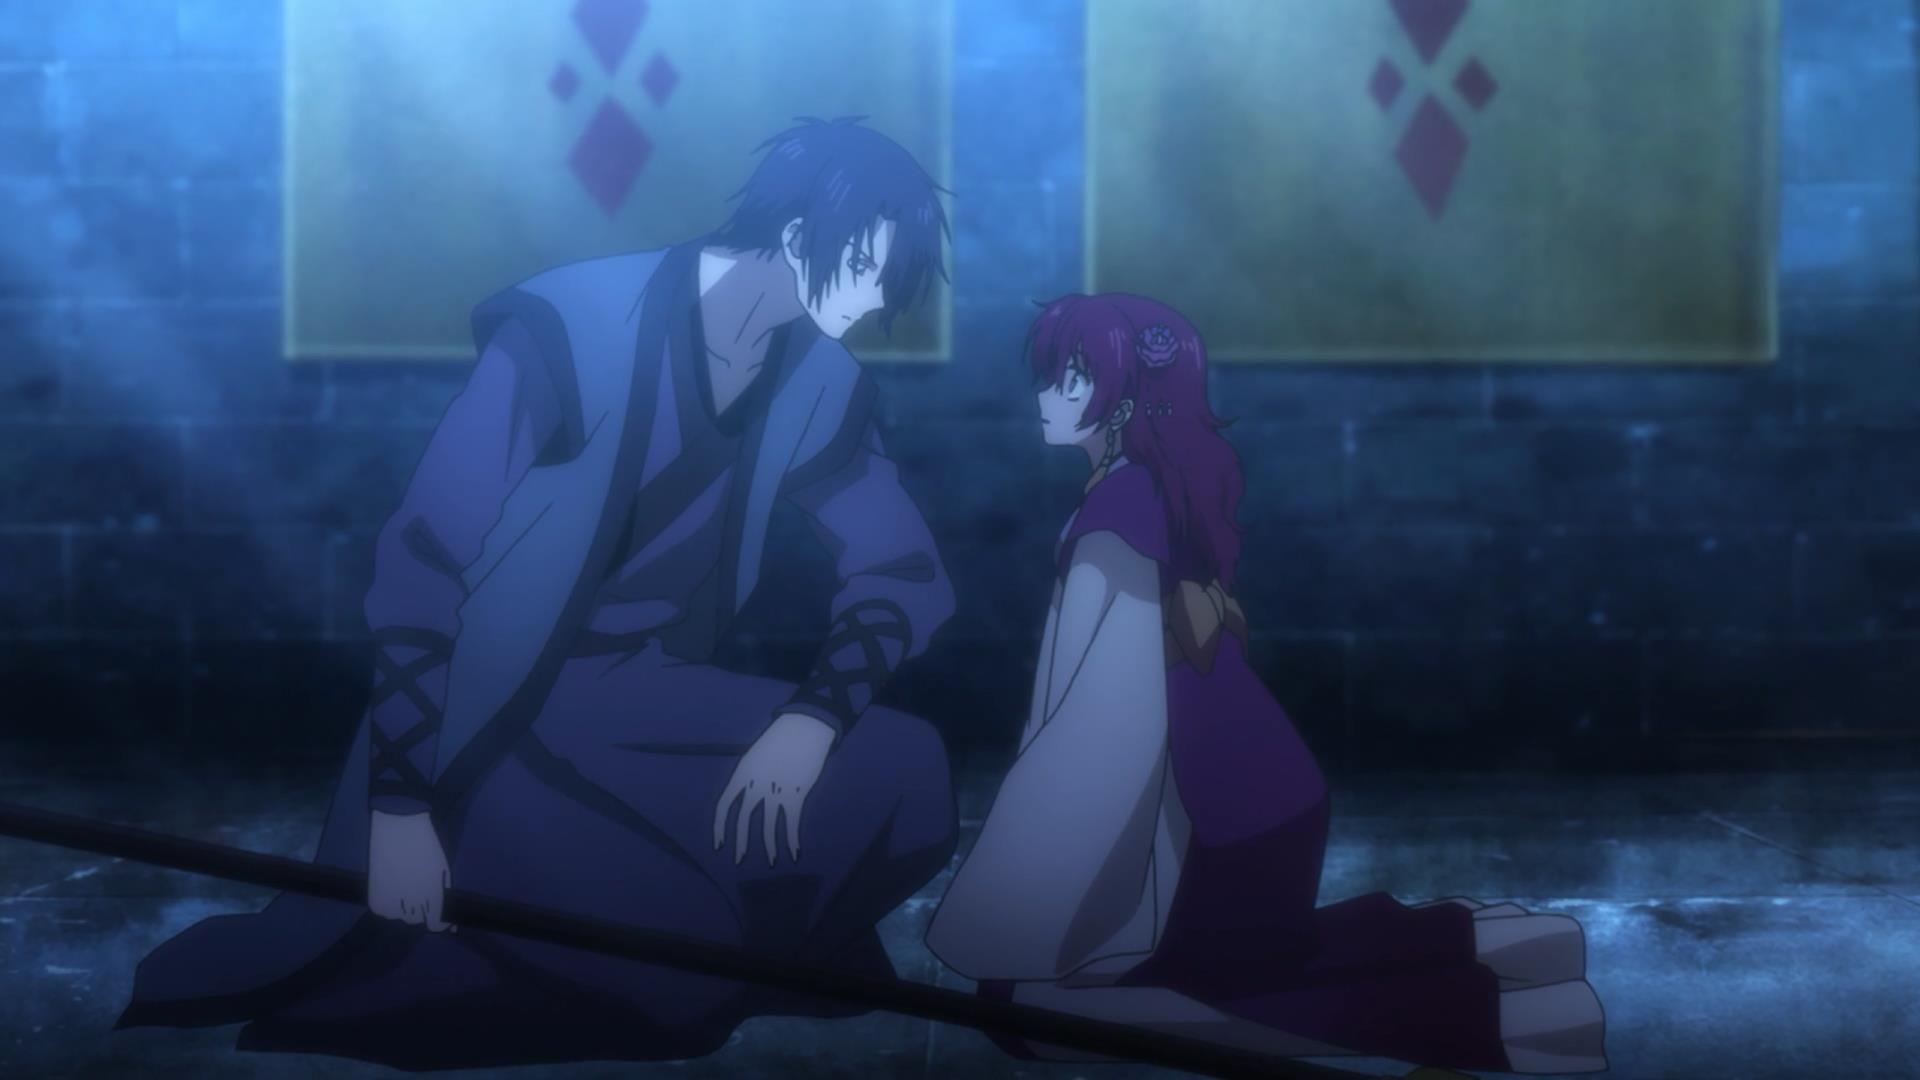 Akatsuki No Yona Anime Boy And Girl Kawaii Cute Hak X Yona Love